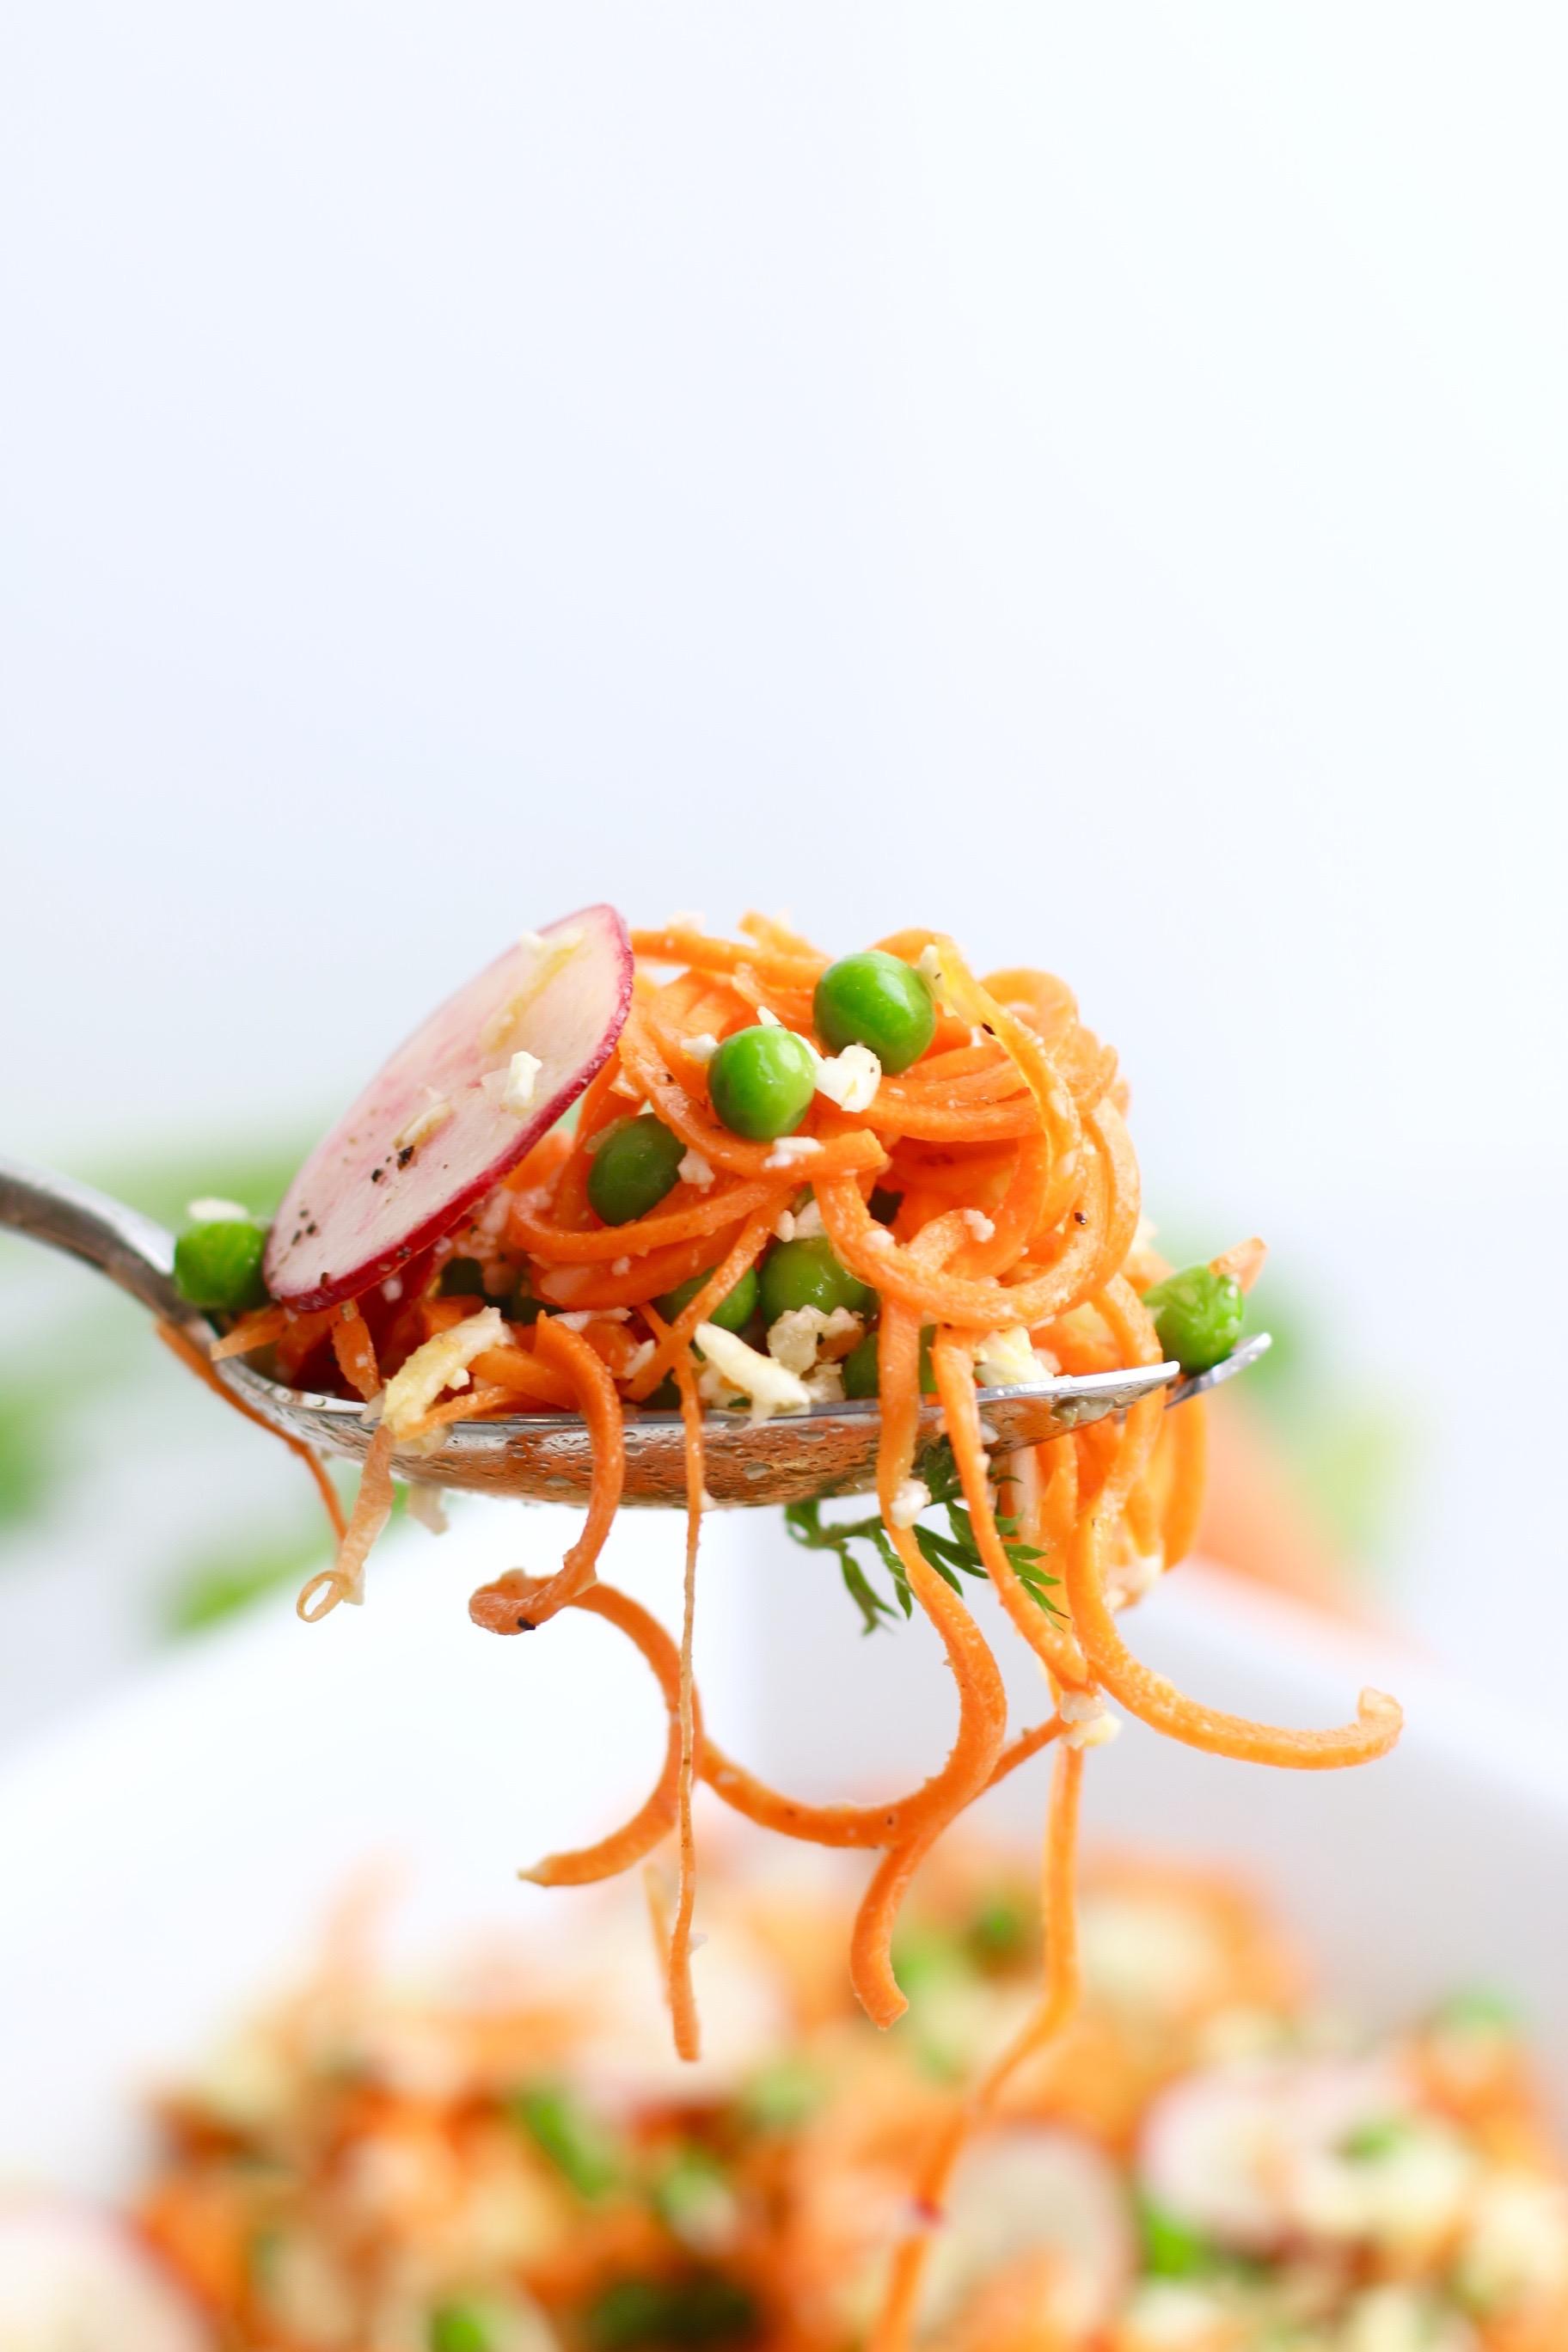 Vegan Pea and Carrot Salad